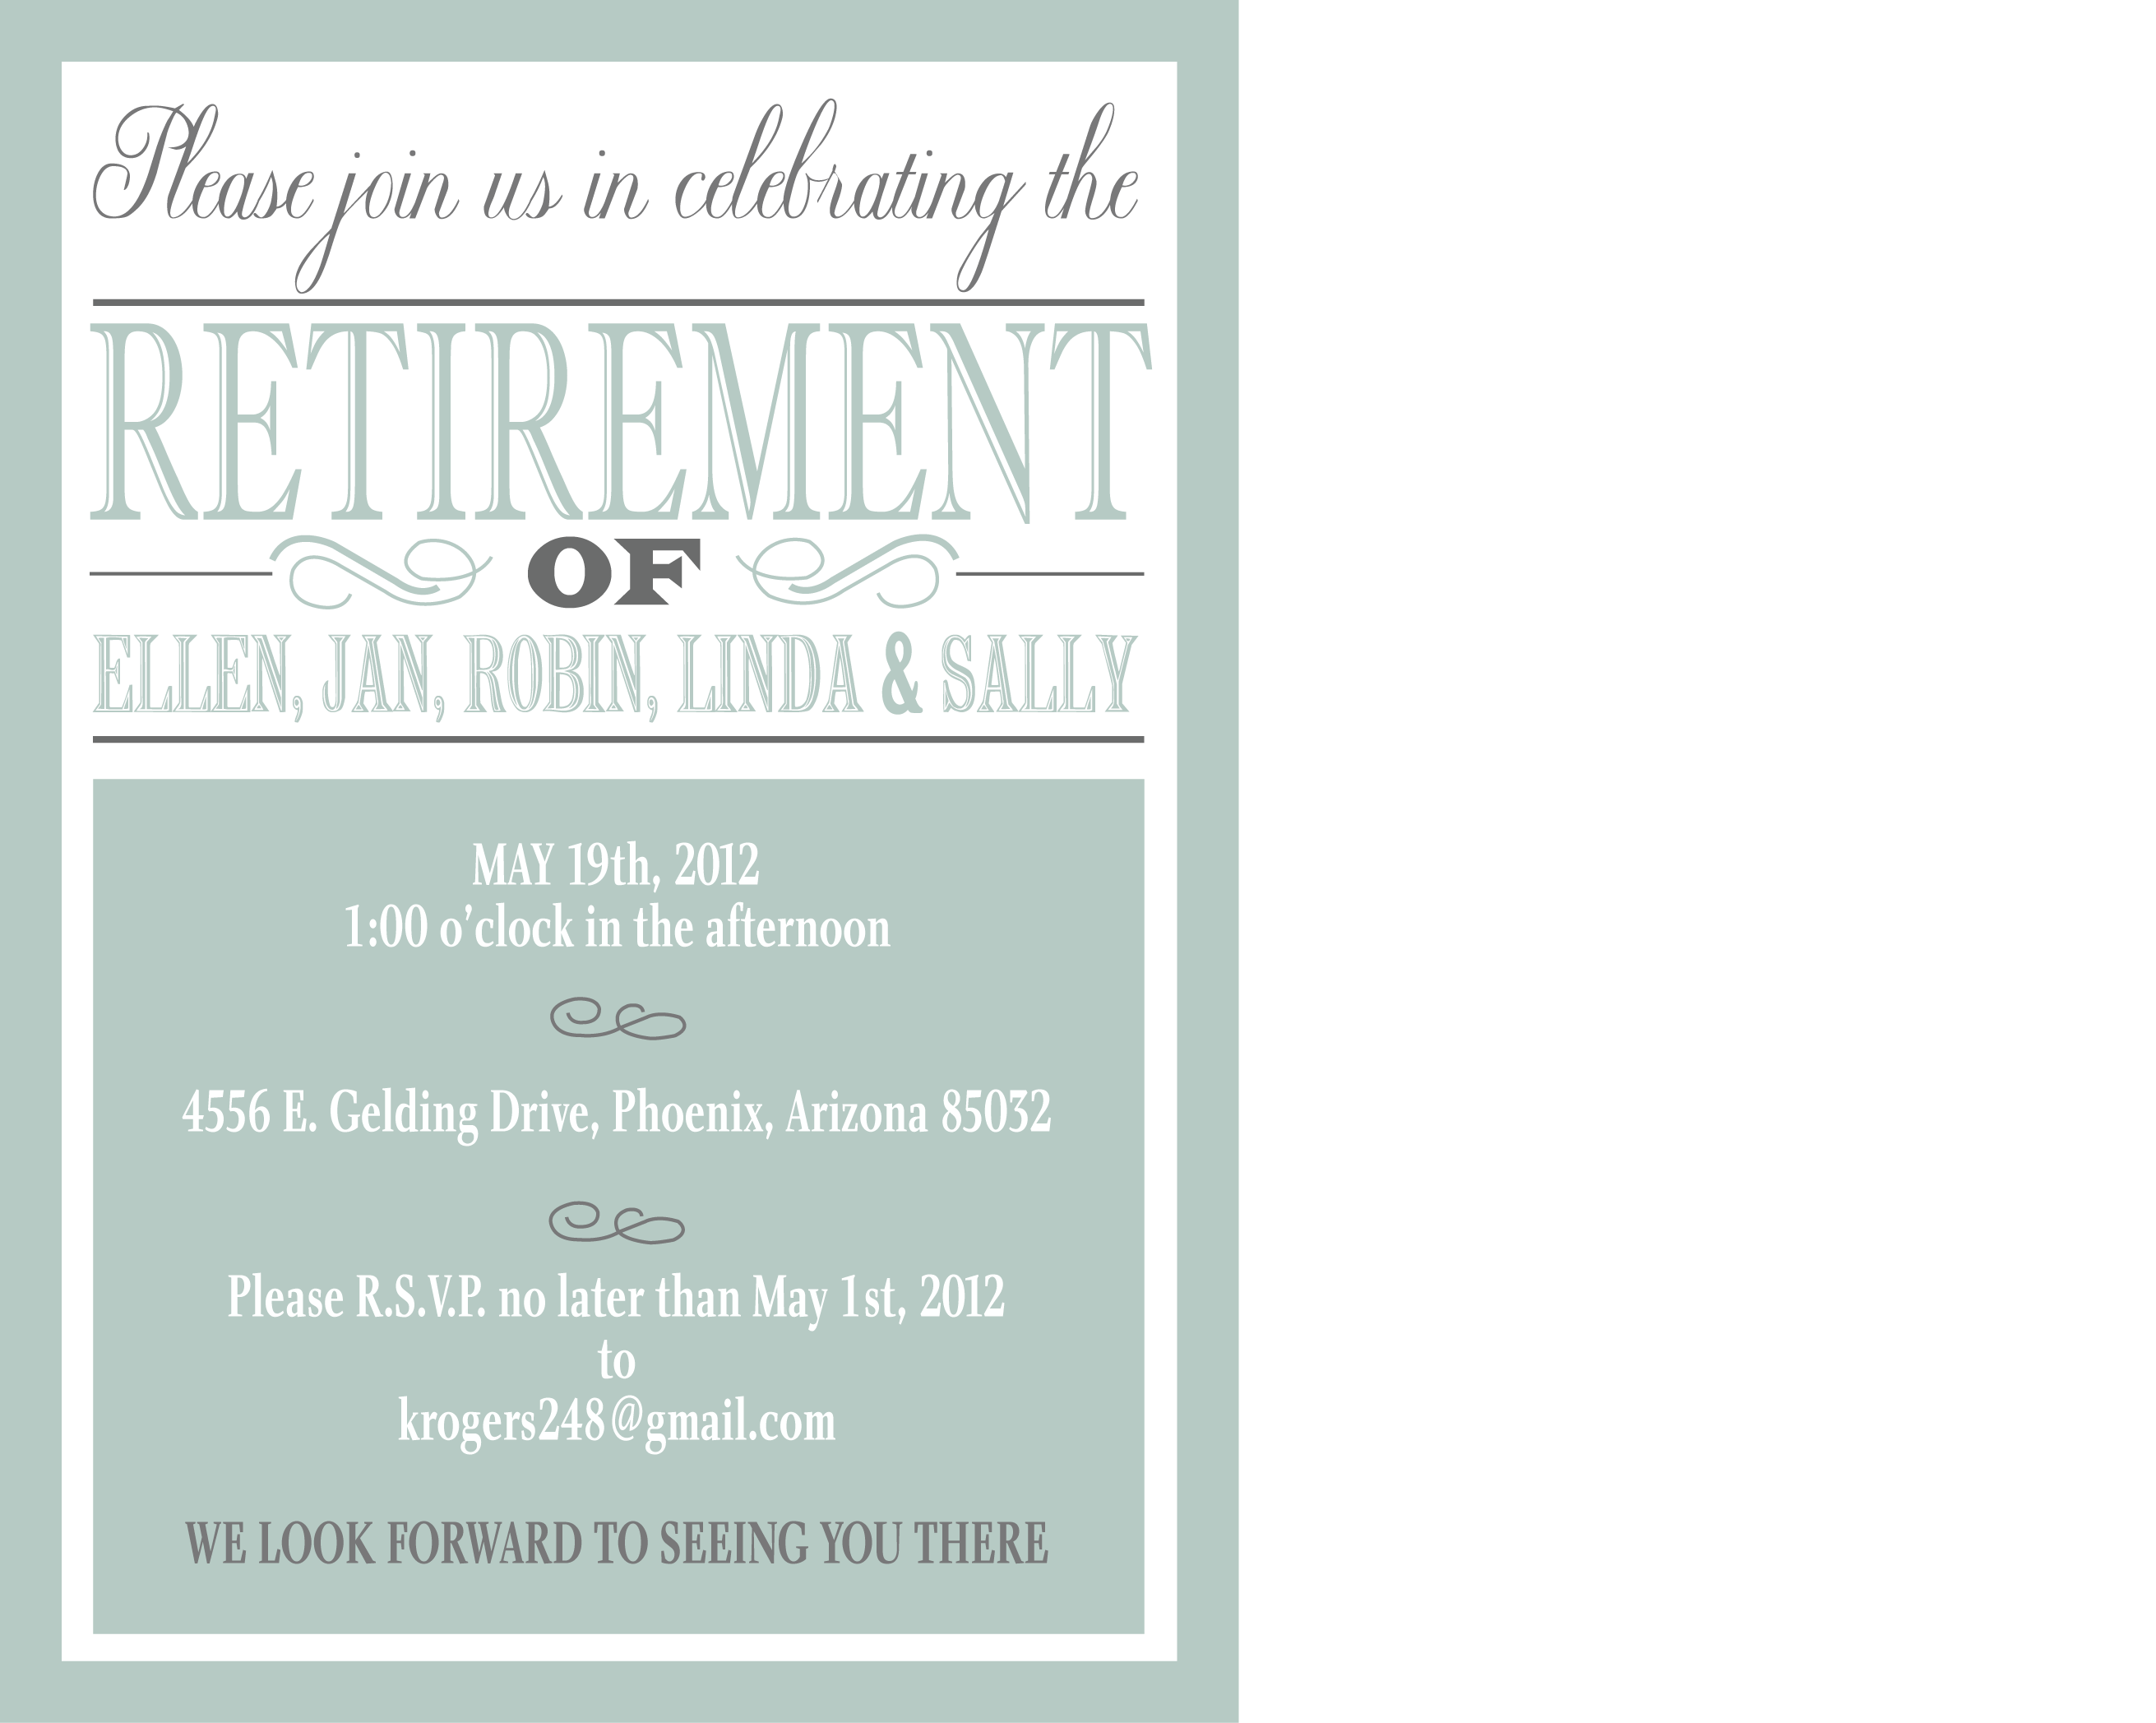 Retirement Party Invite Graduation Party Invitation Wording Online Party Invitations Party Invite Template